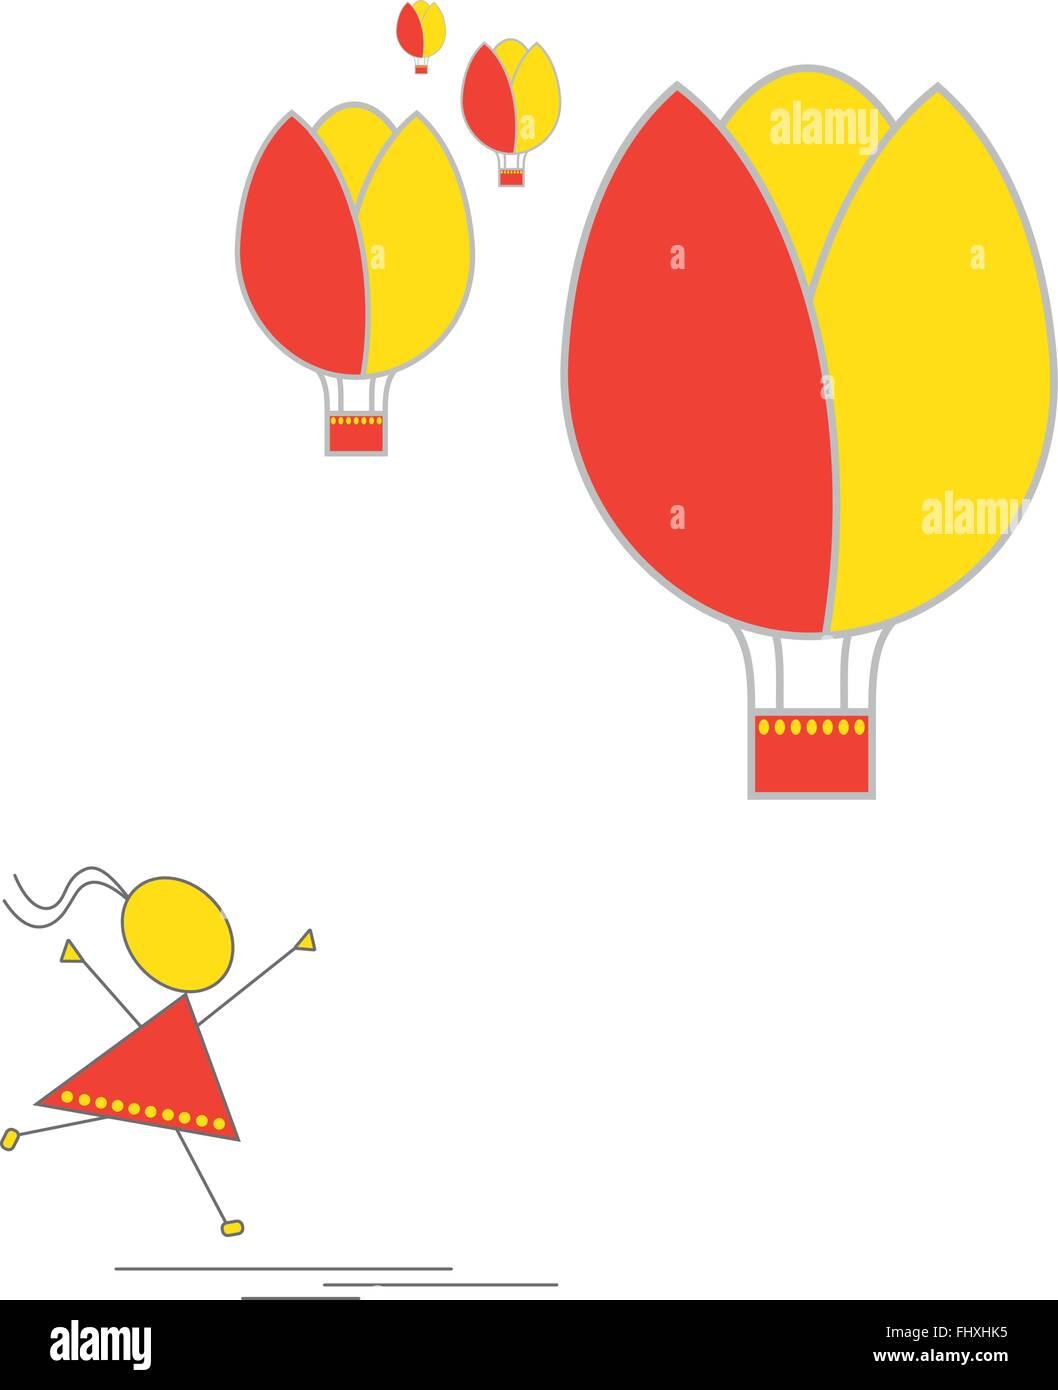 Flower Hot Air Balloon Stock Photos & Flower Hot Air Balloon Stock ...